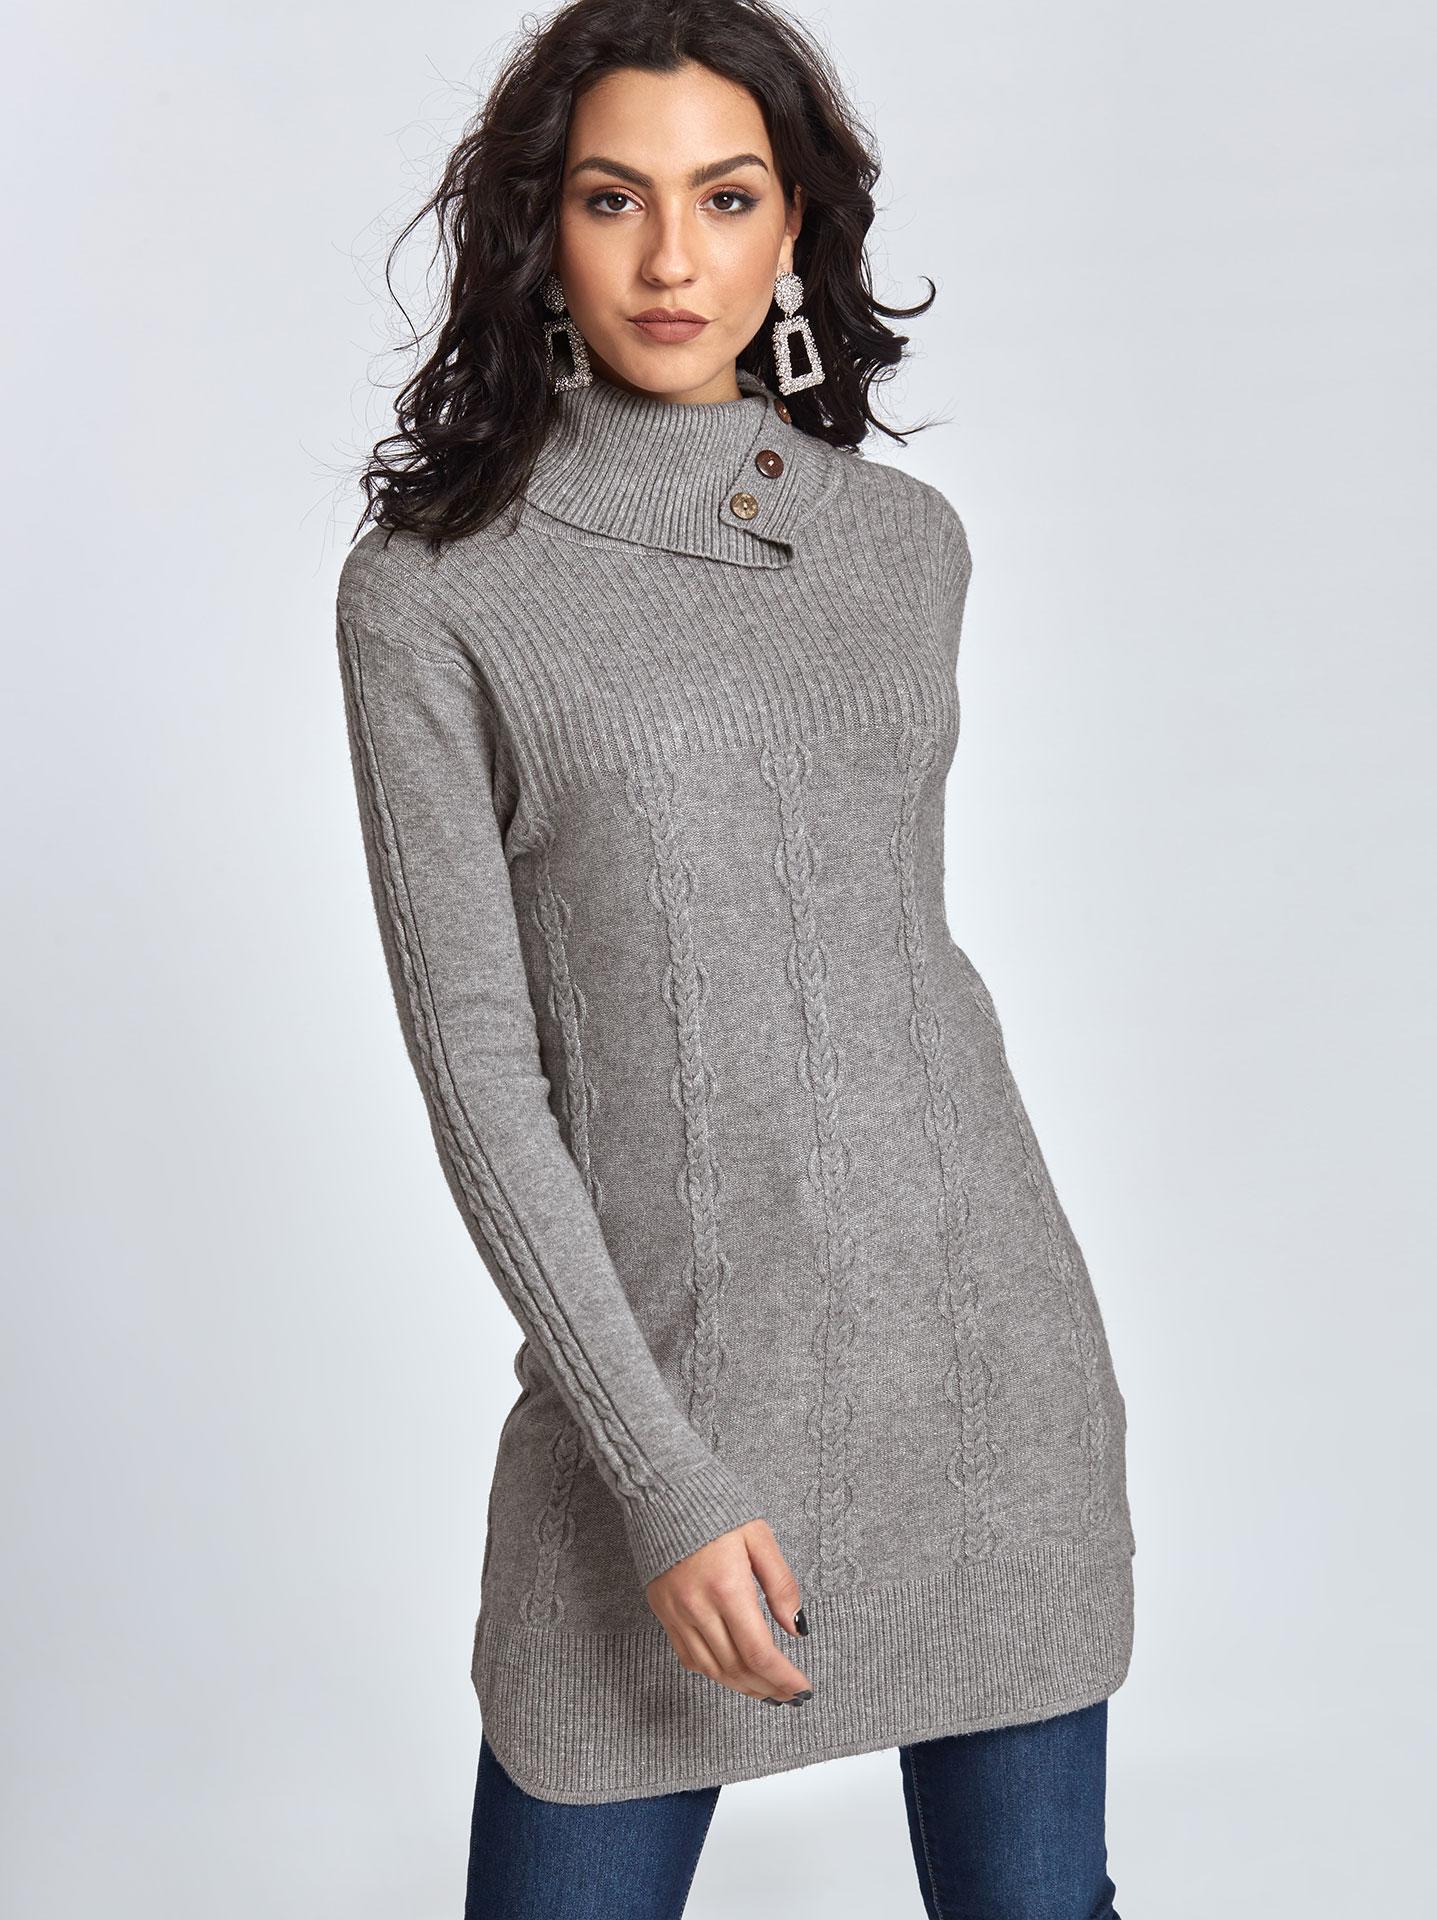 91e8fb88828b Μακρύ πουλόβερ με κουμπιά σε γκρι